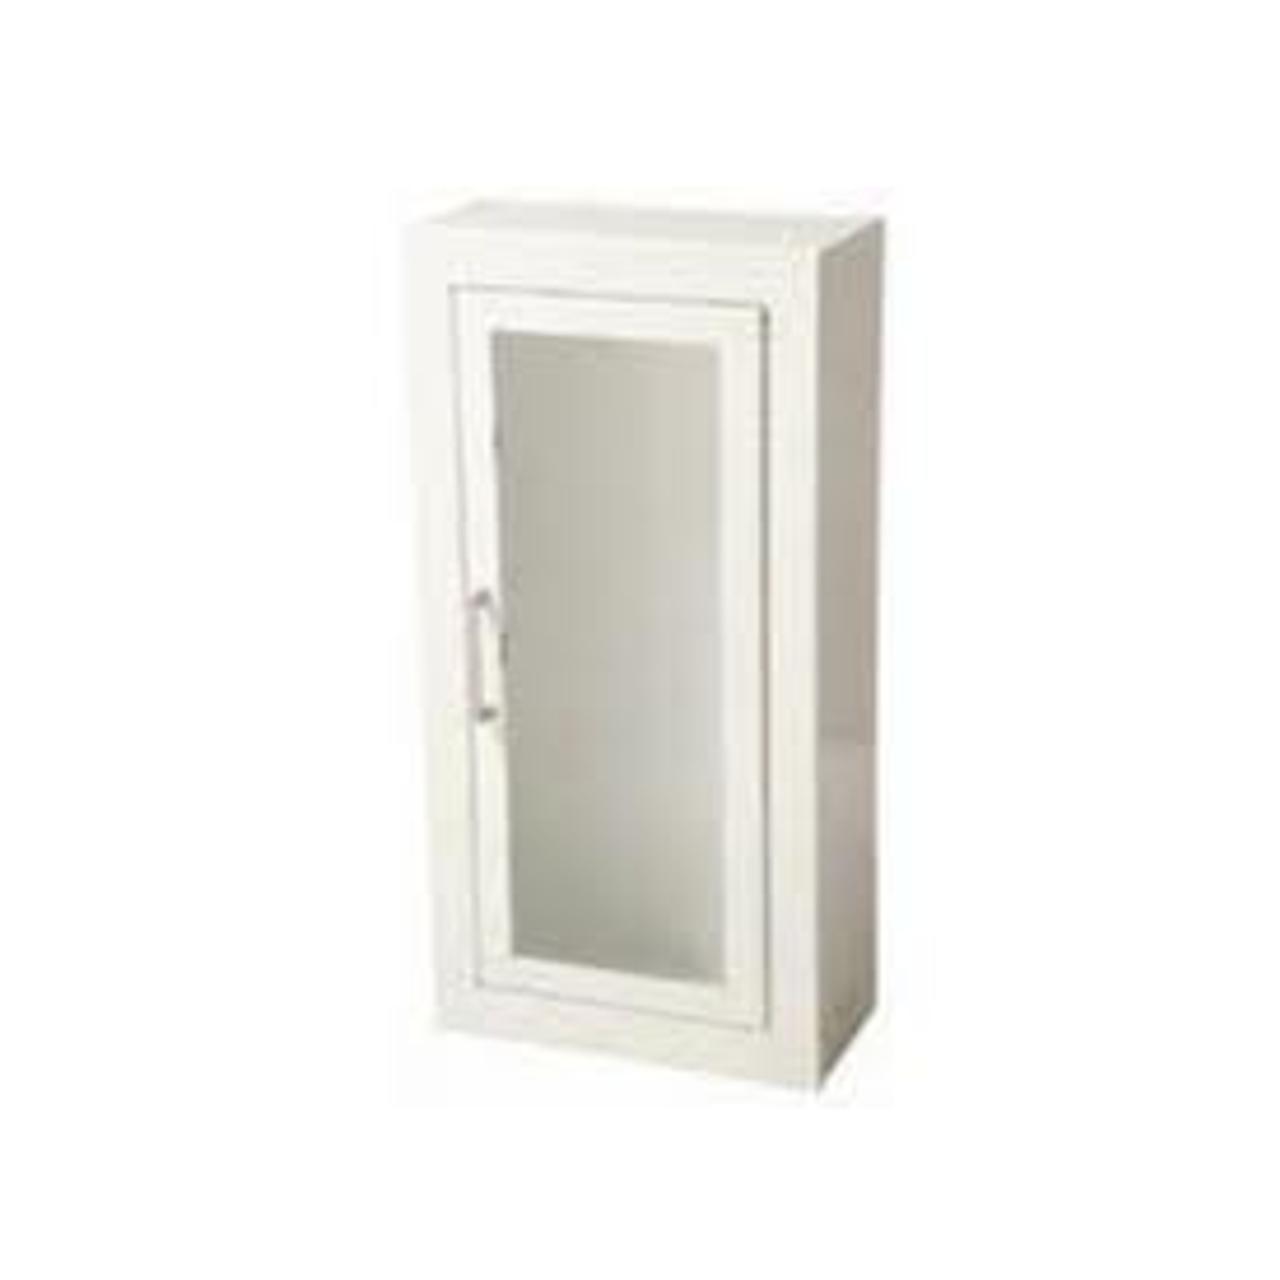 8115 Flat Trim Steel Cabinet